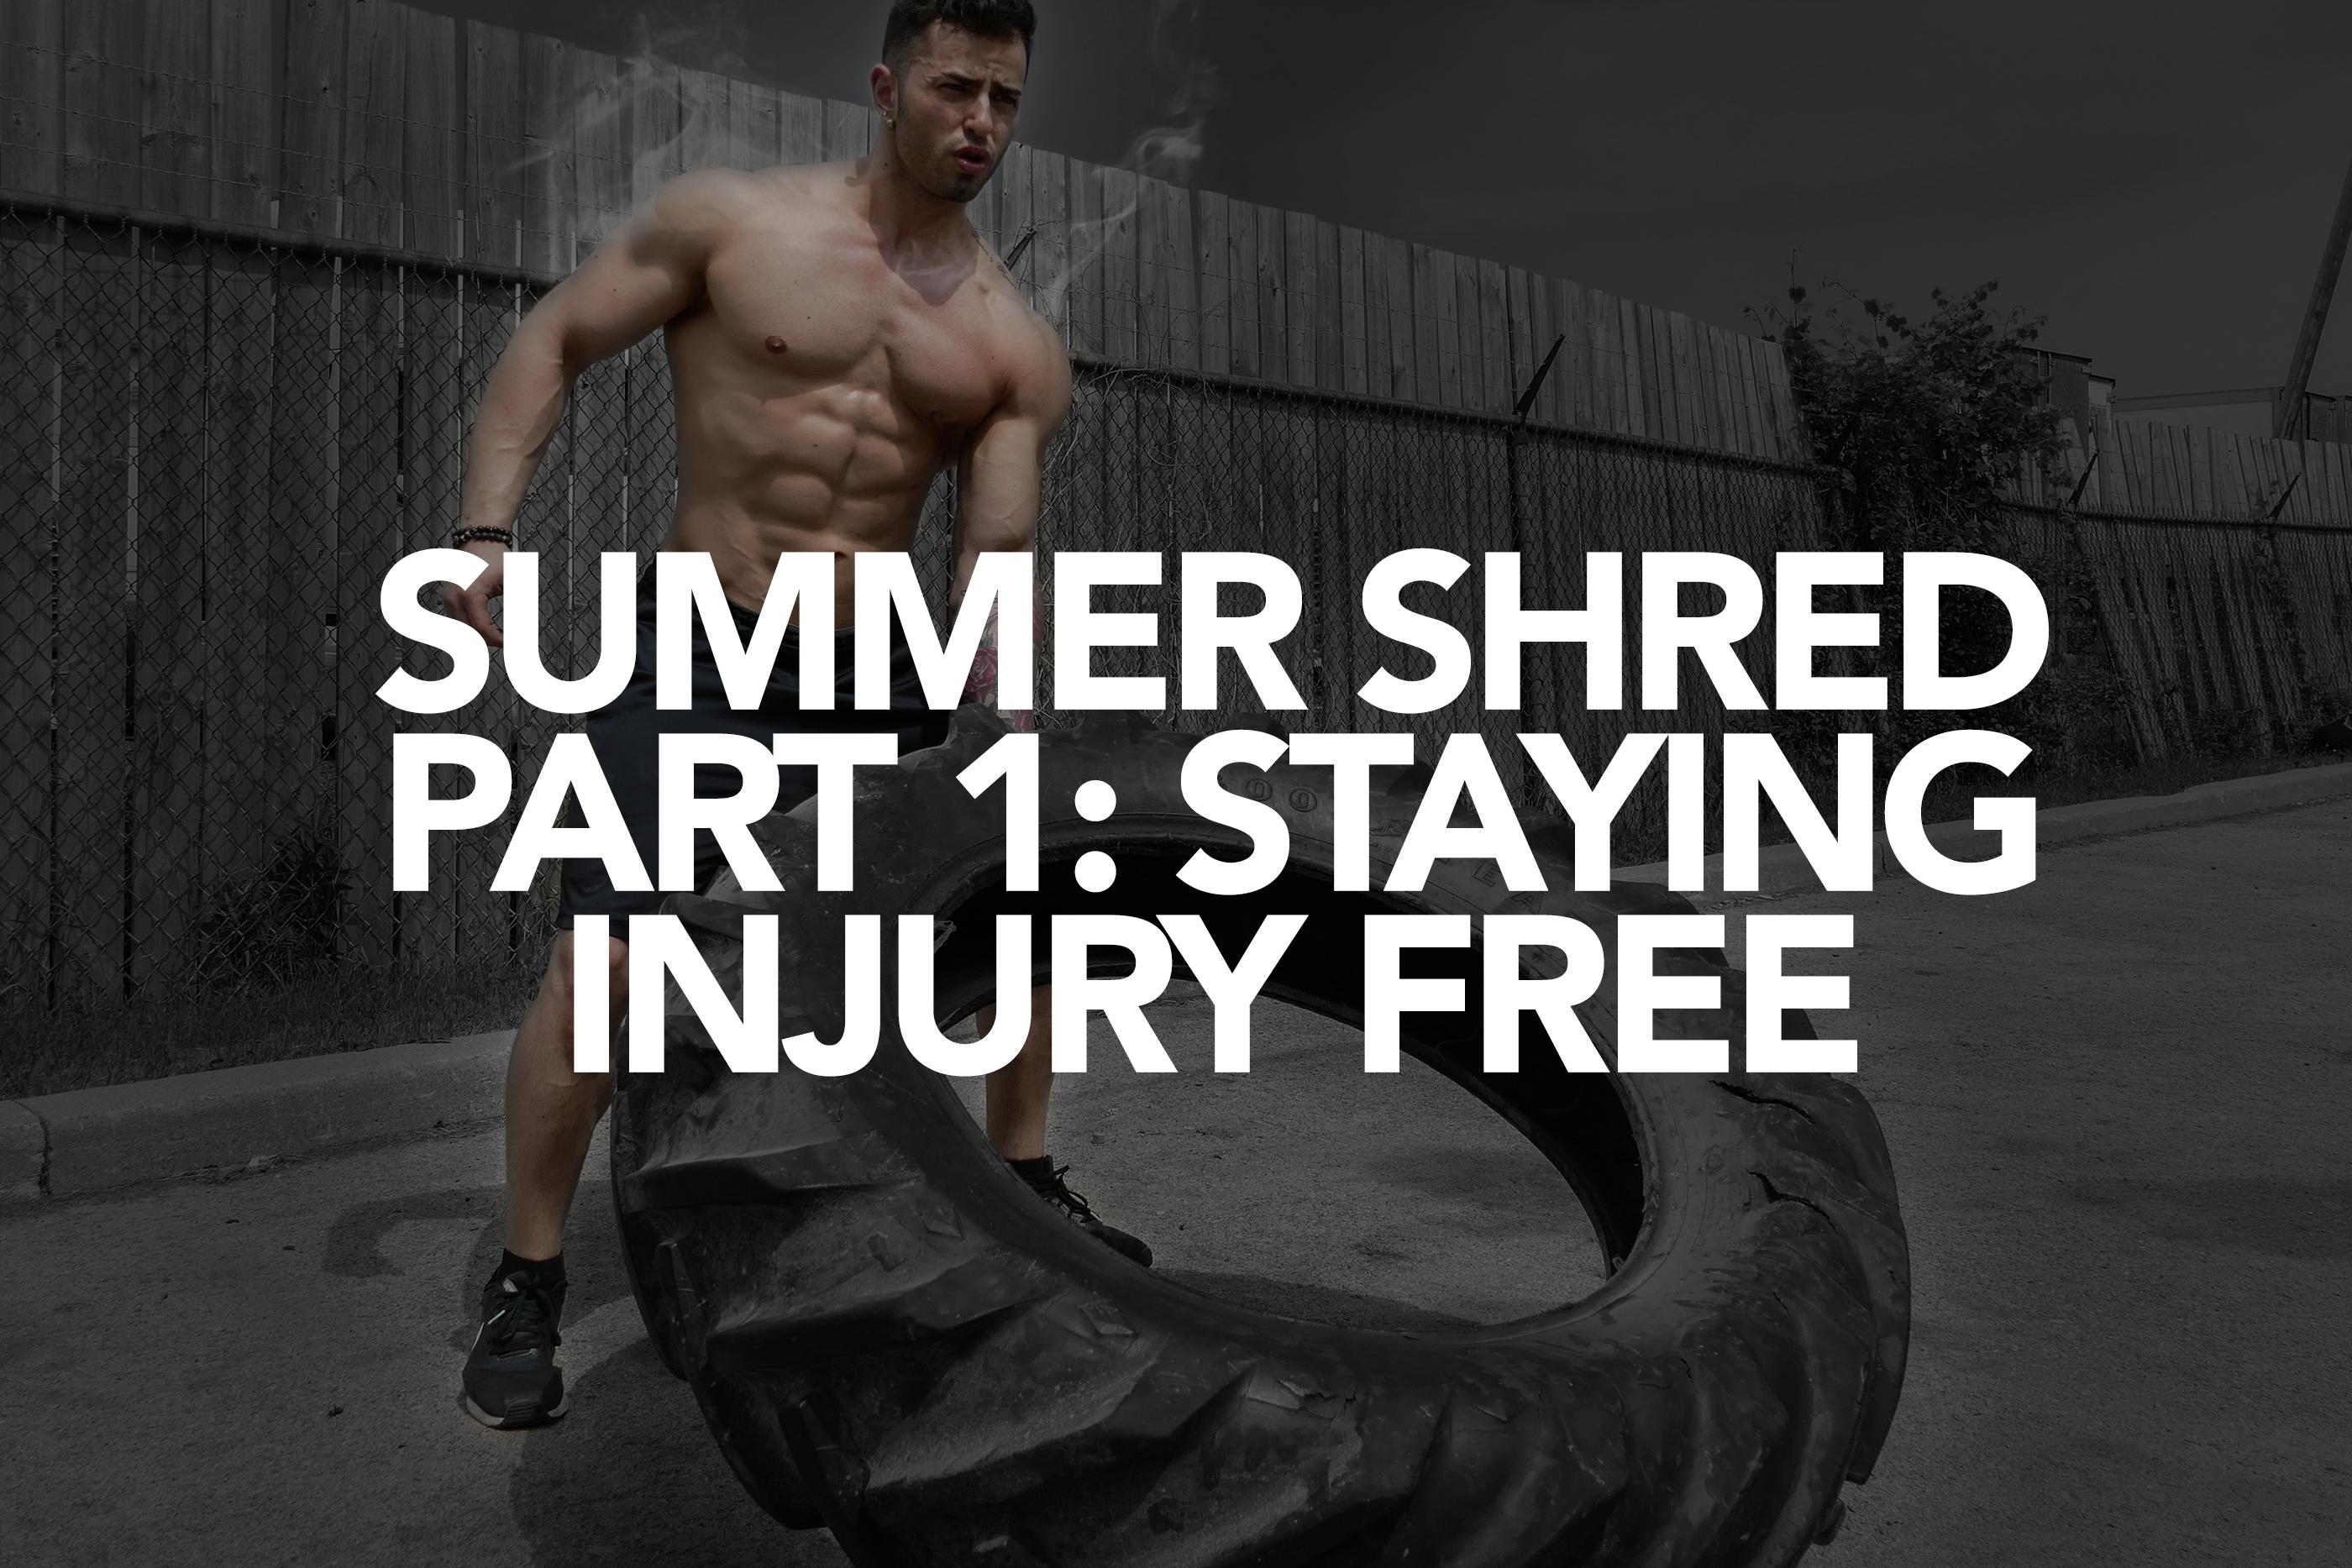 Summer Shredding Part 1: Staying Injury Free